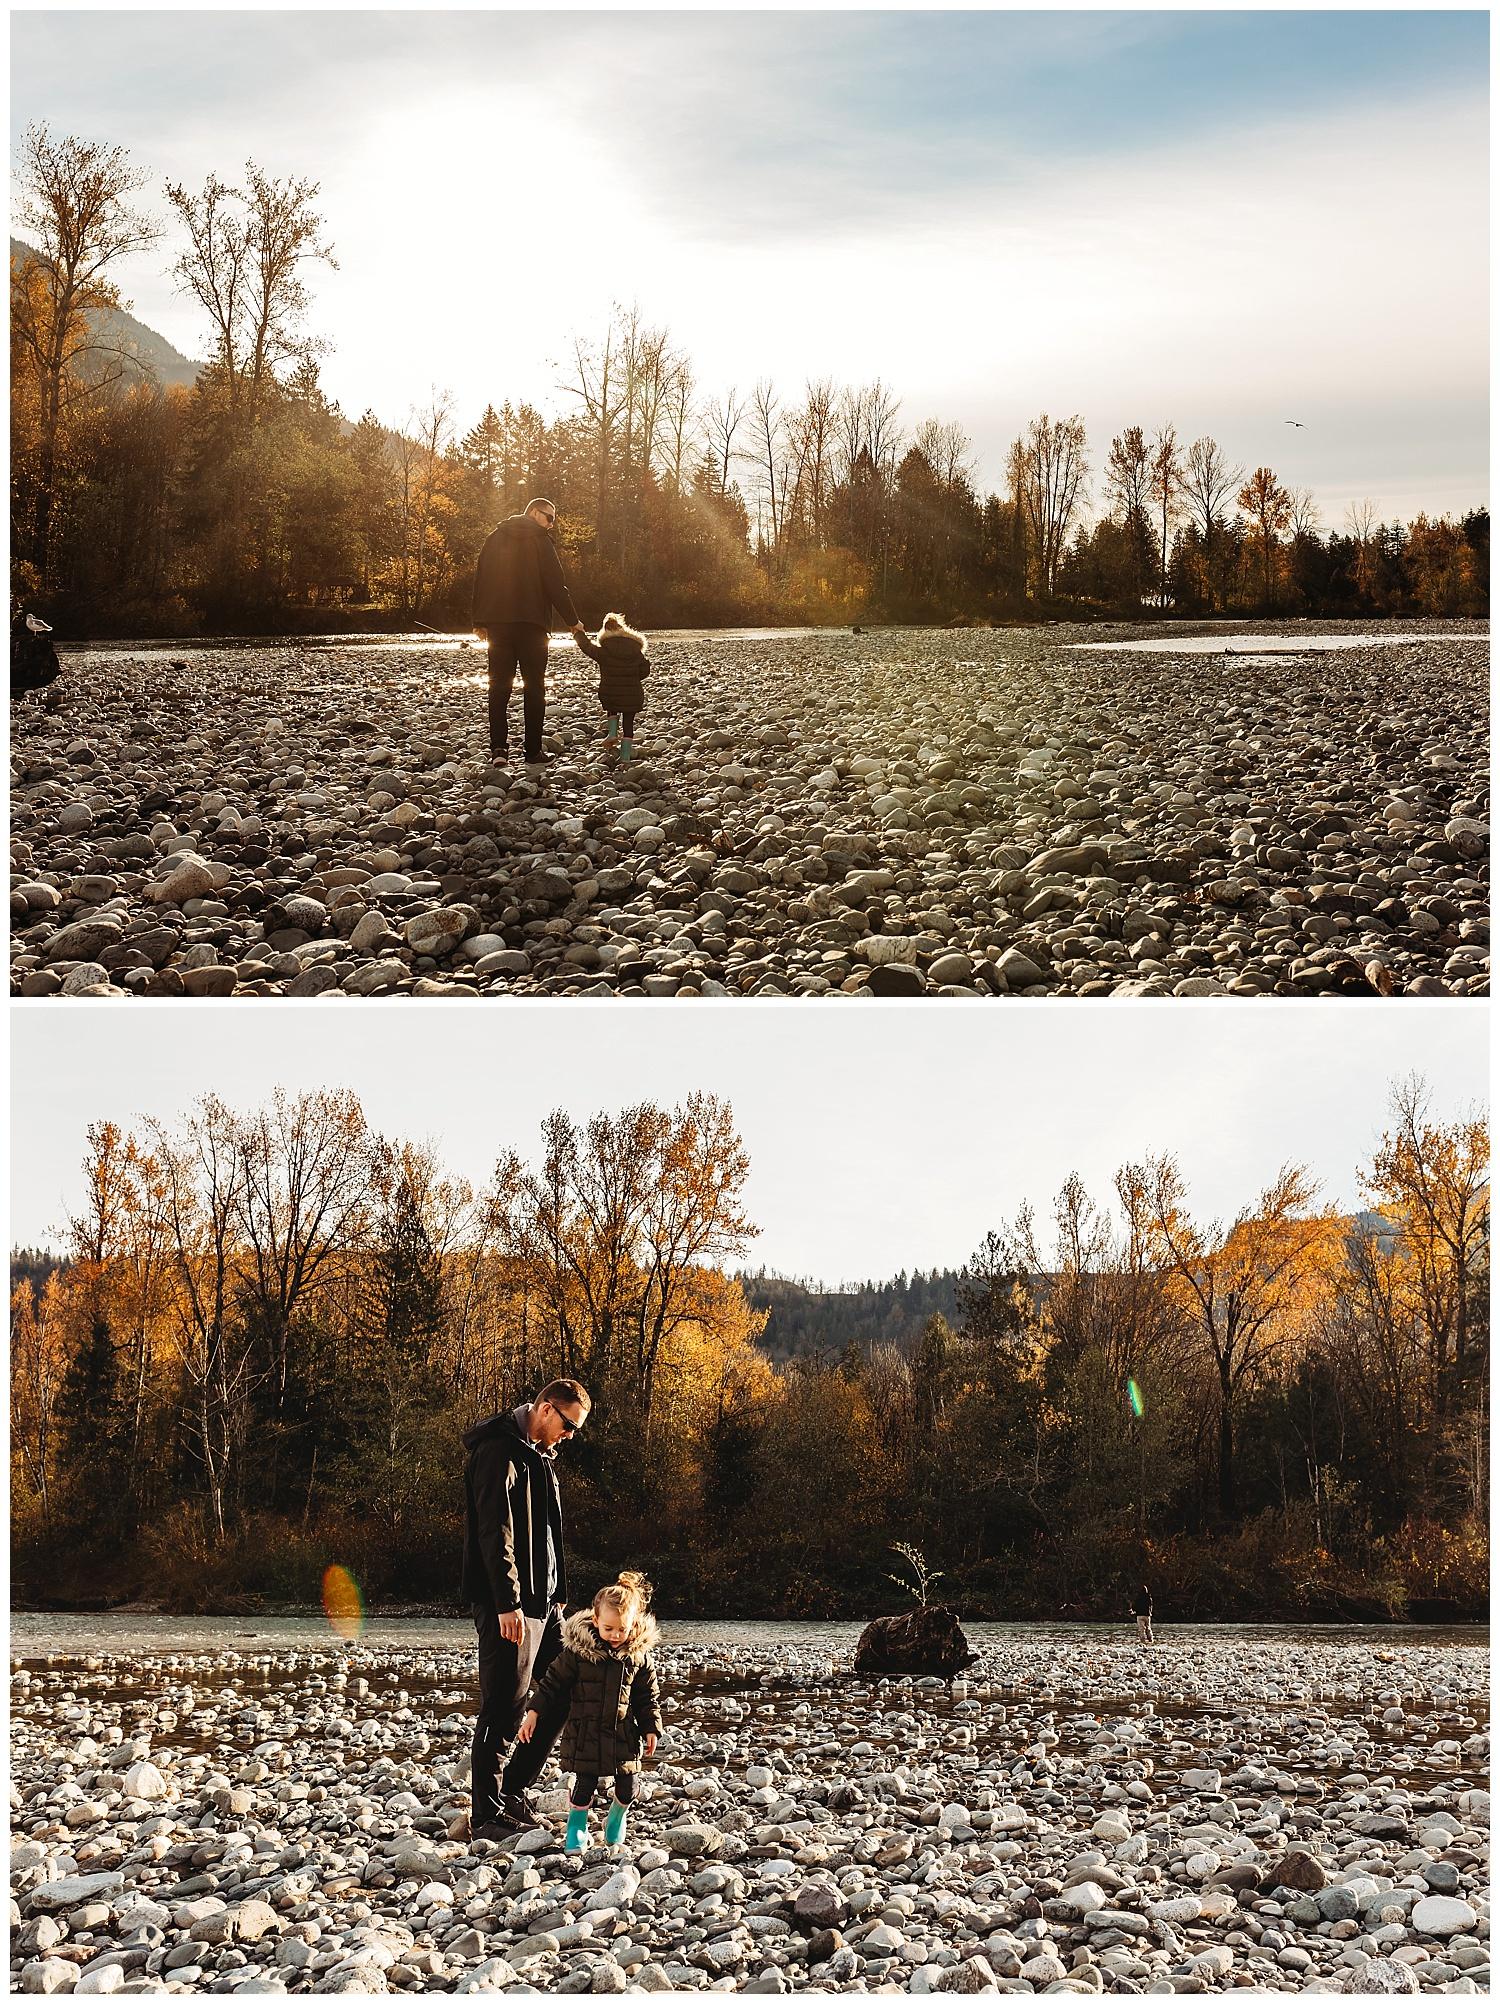 Vedder River Chilliwack BC 4.jpg